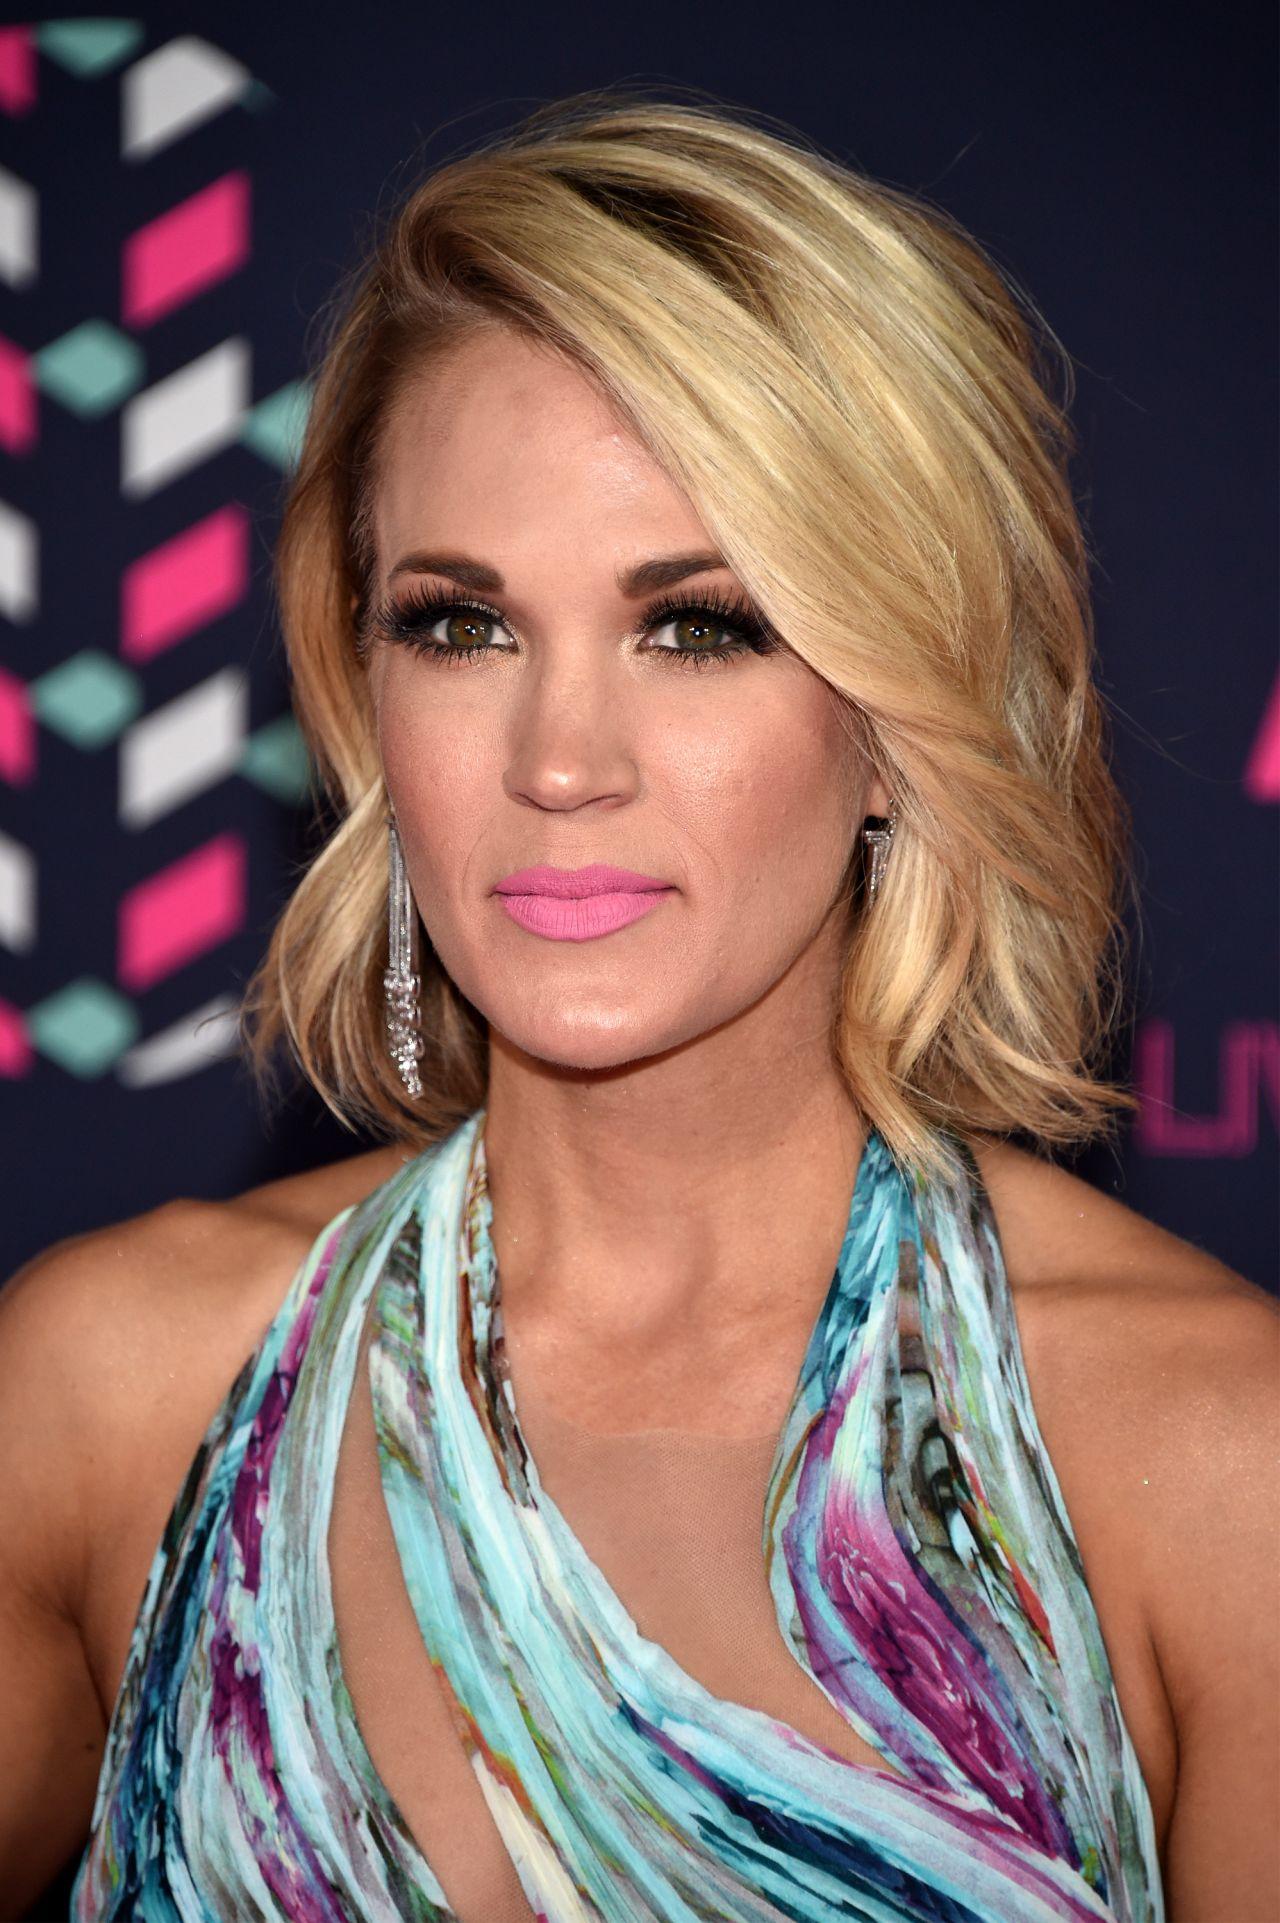 Carrie Underwood 2016 Cmt Music Awards Nashville 548510